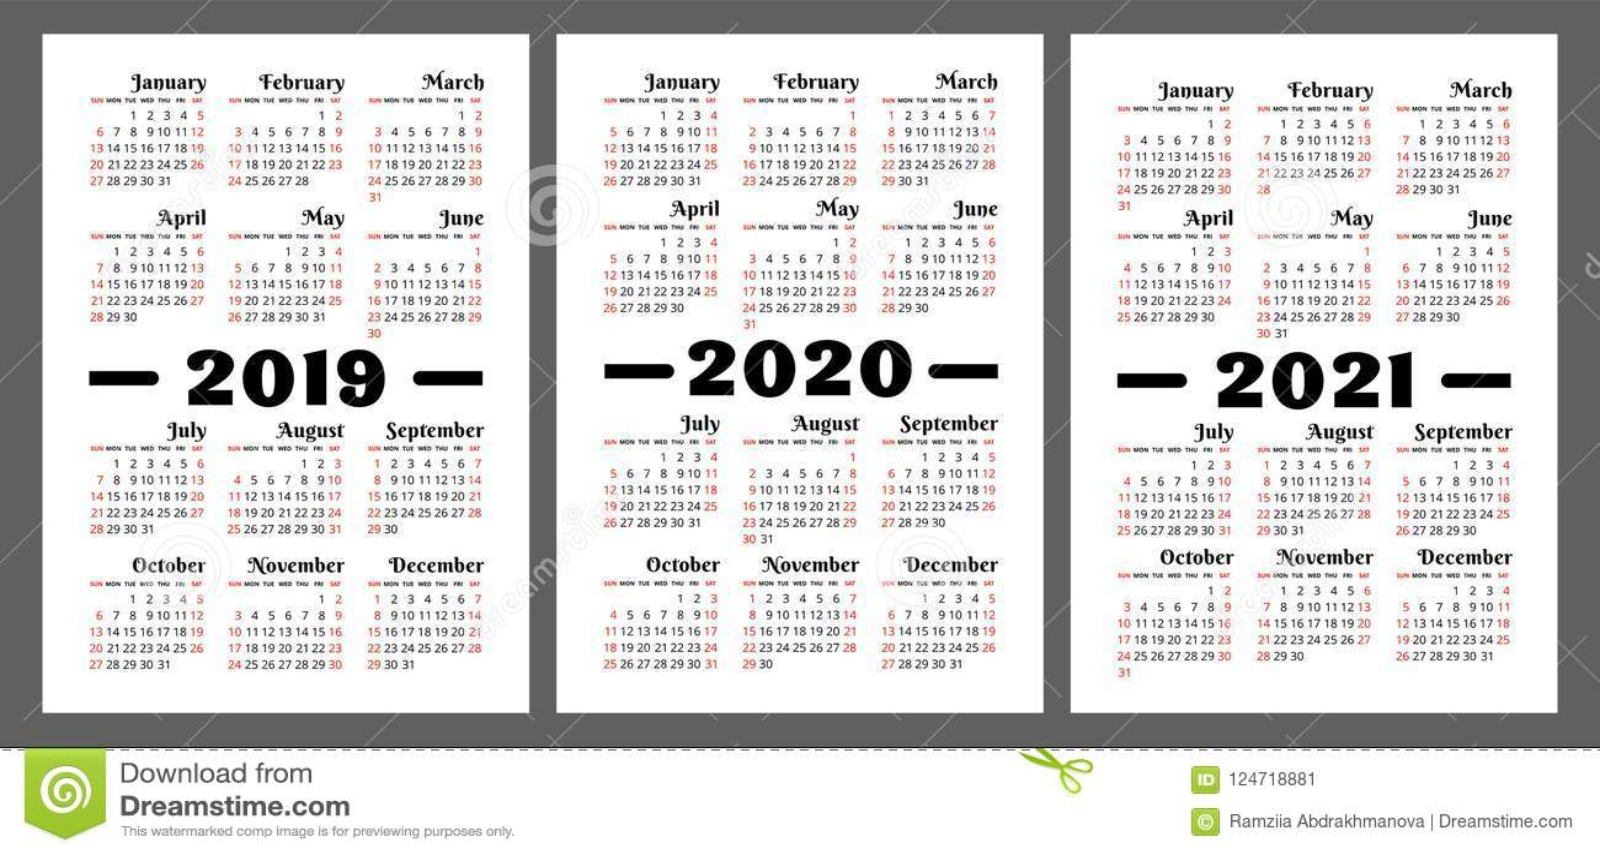 Calendario Settimane Anno 2019.Calendario 2019 2020 2021 Anno Insieme Variopinto Di